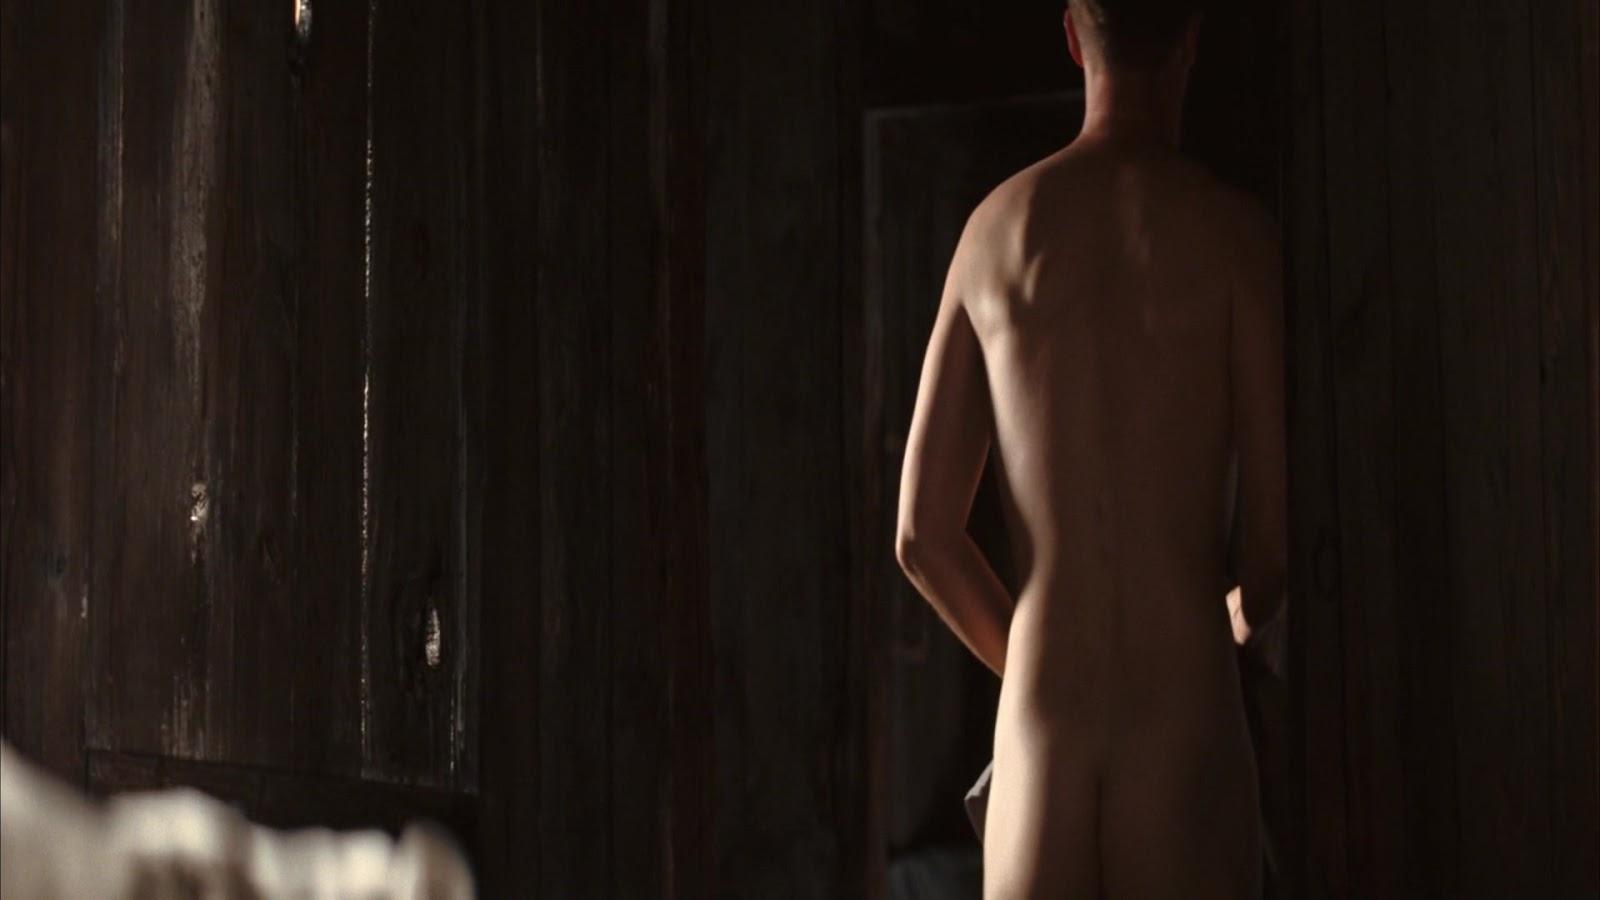 Ed Norton Naked In Birdman